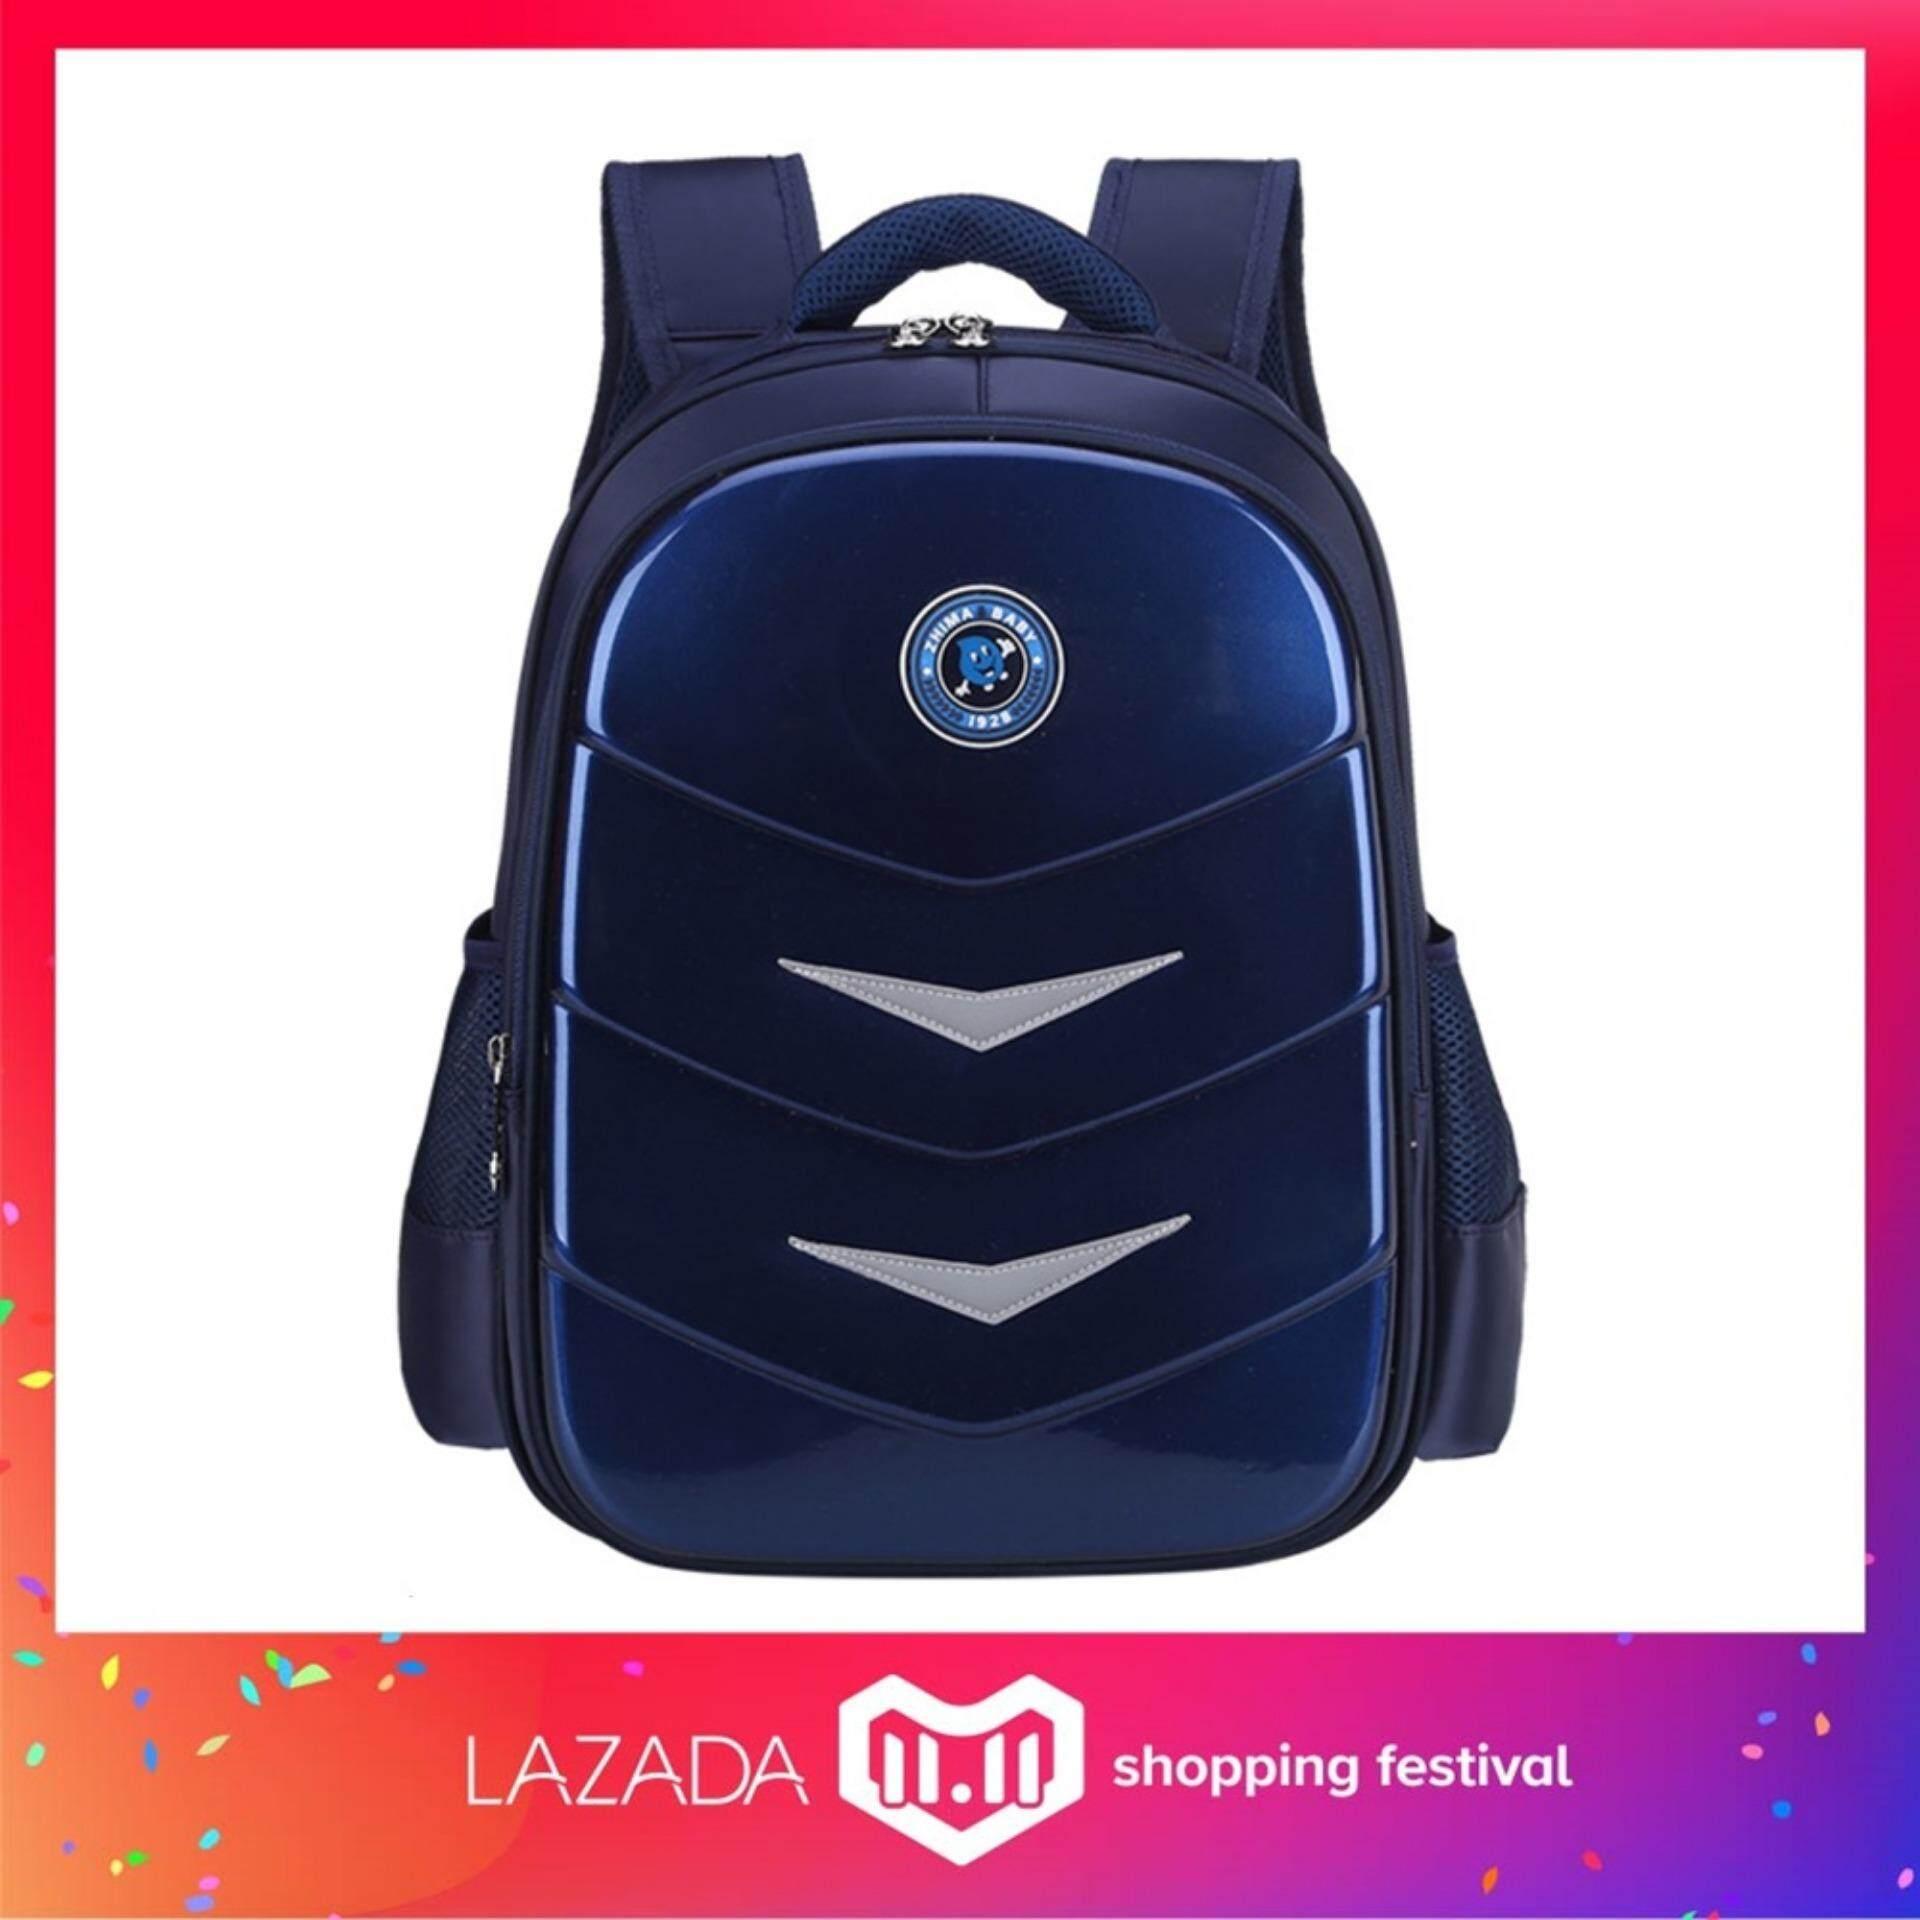 【TEEMI】Hard Shell Bright Primary Secondary Nylon Water Resistant Orthopedic School Bag Kids Children Backpack